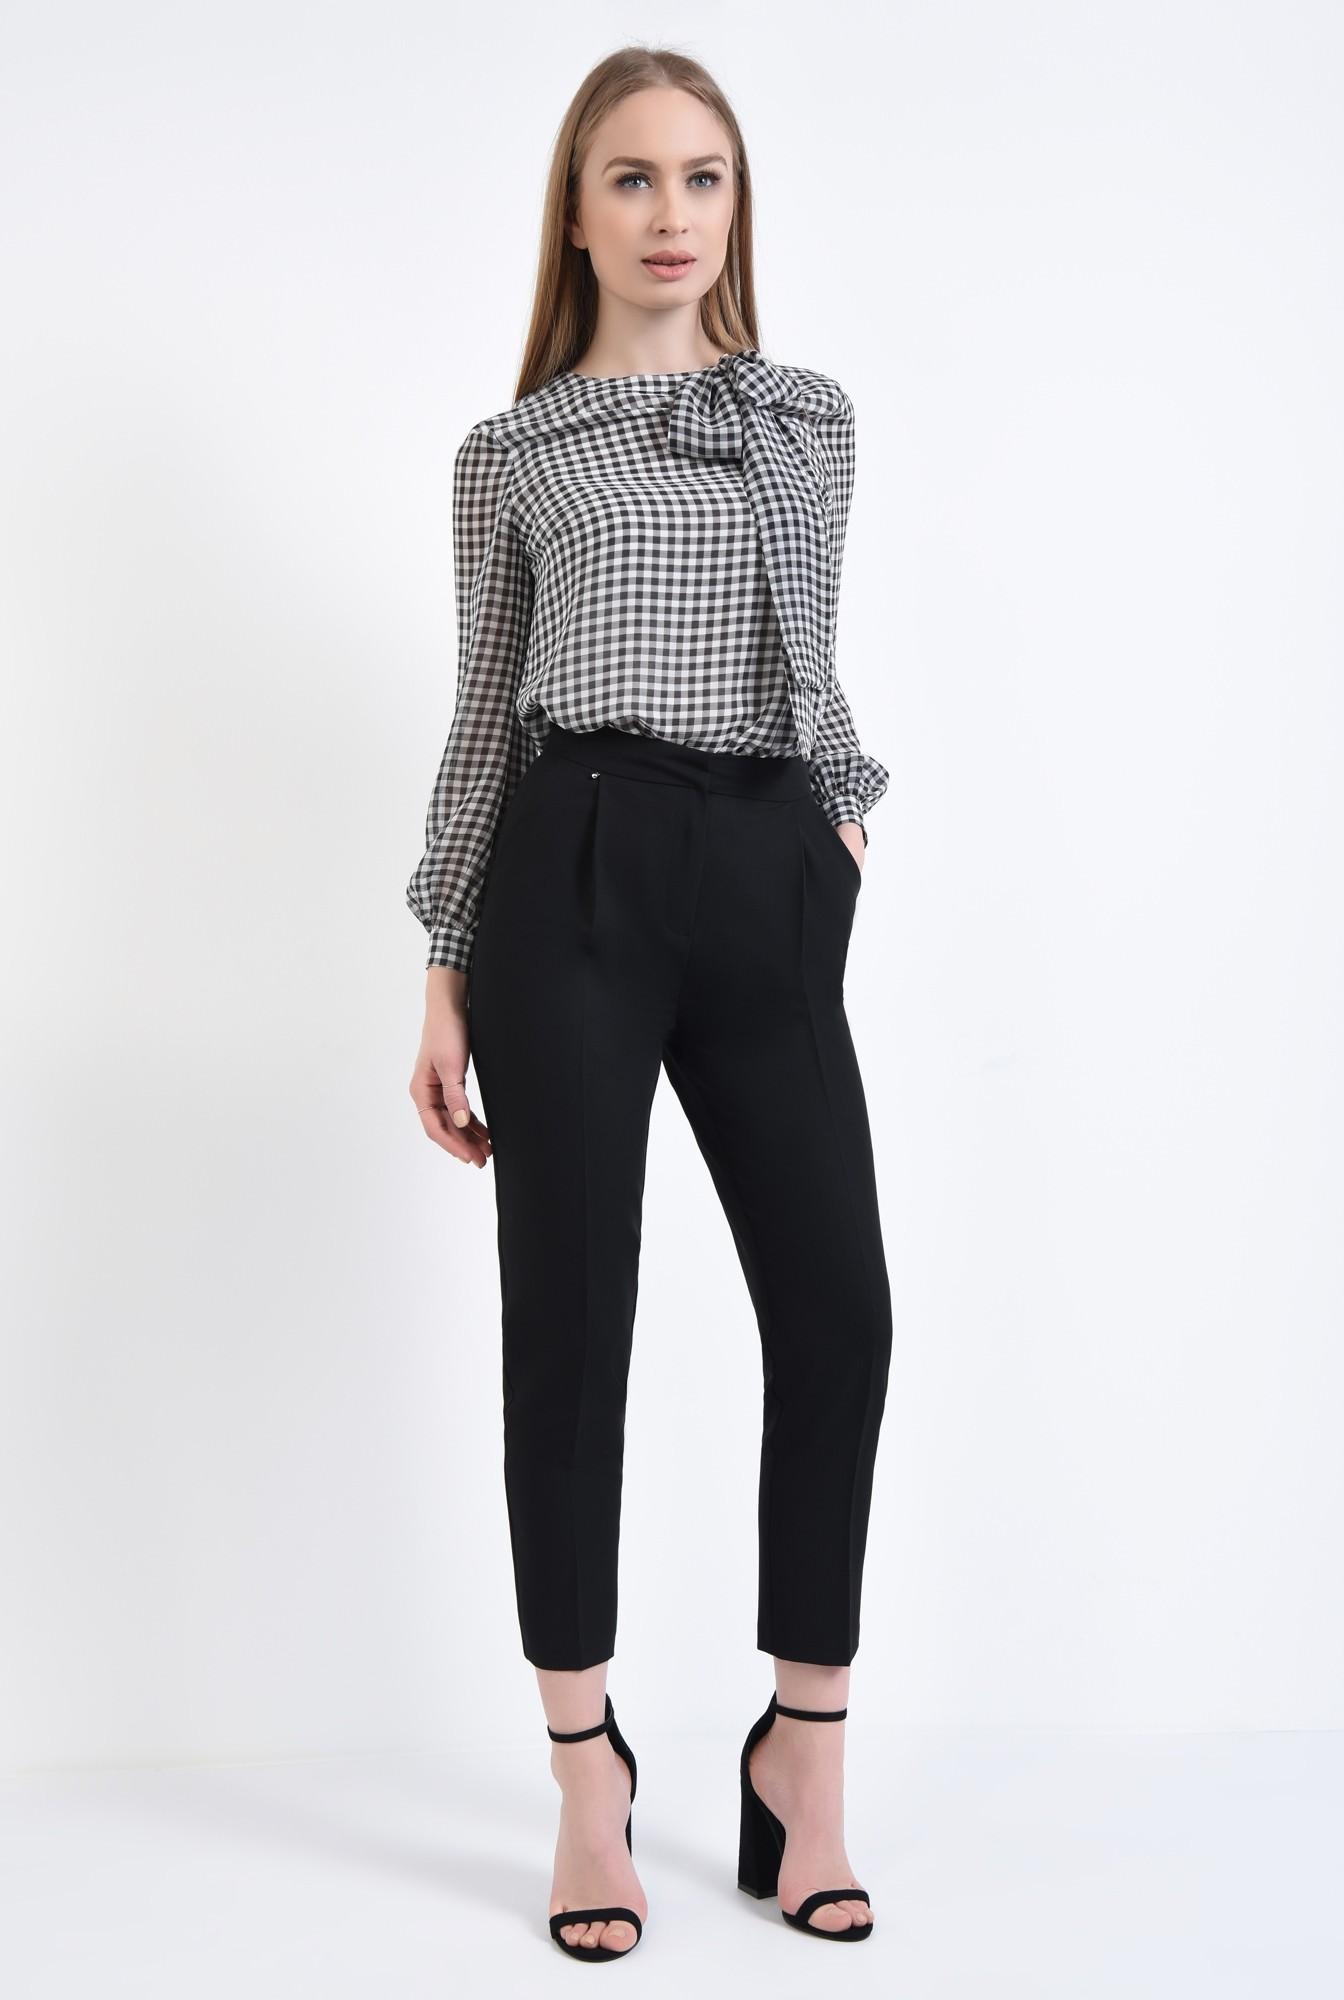 3 - Bluza casual, contrast, alb-negru